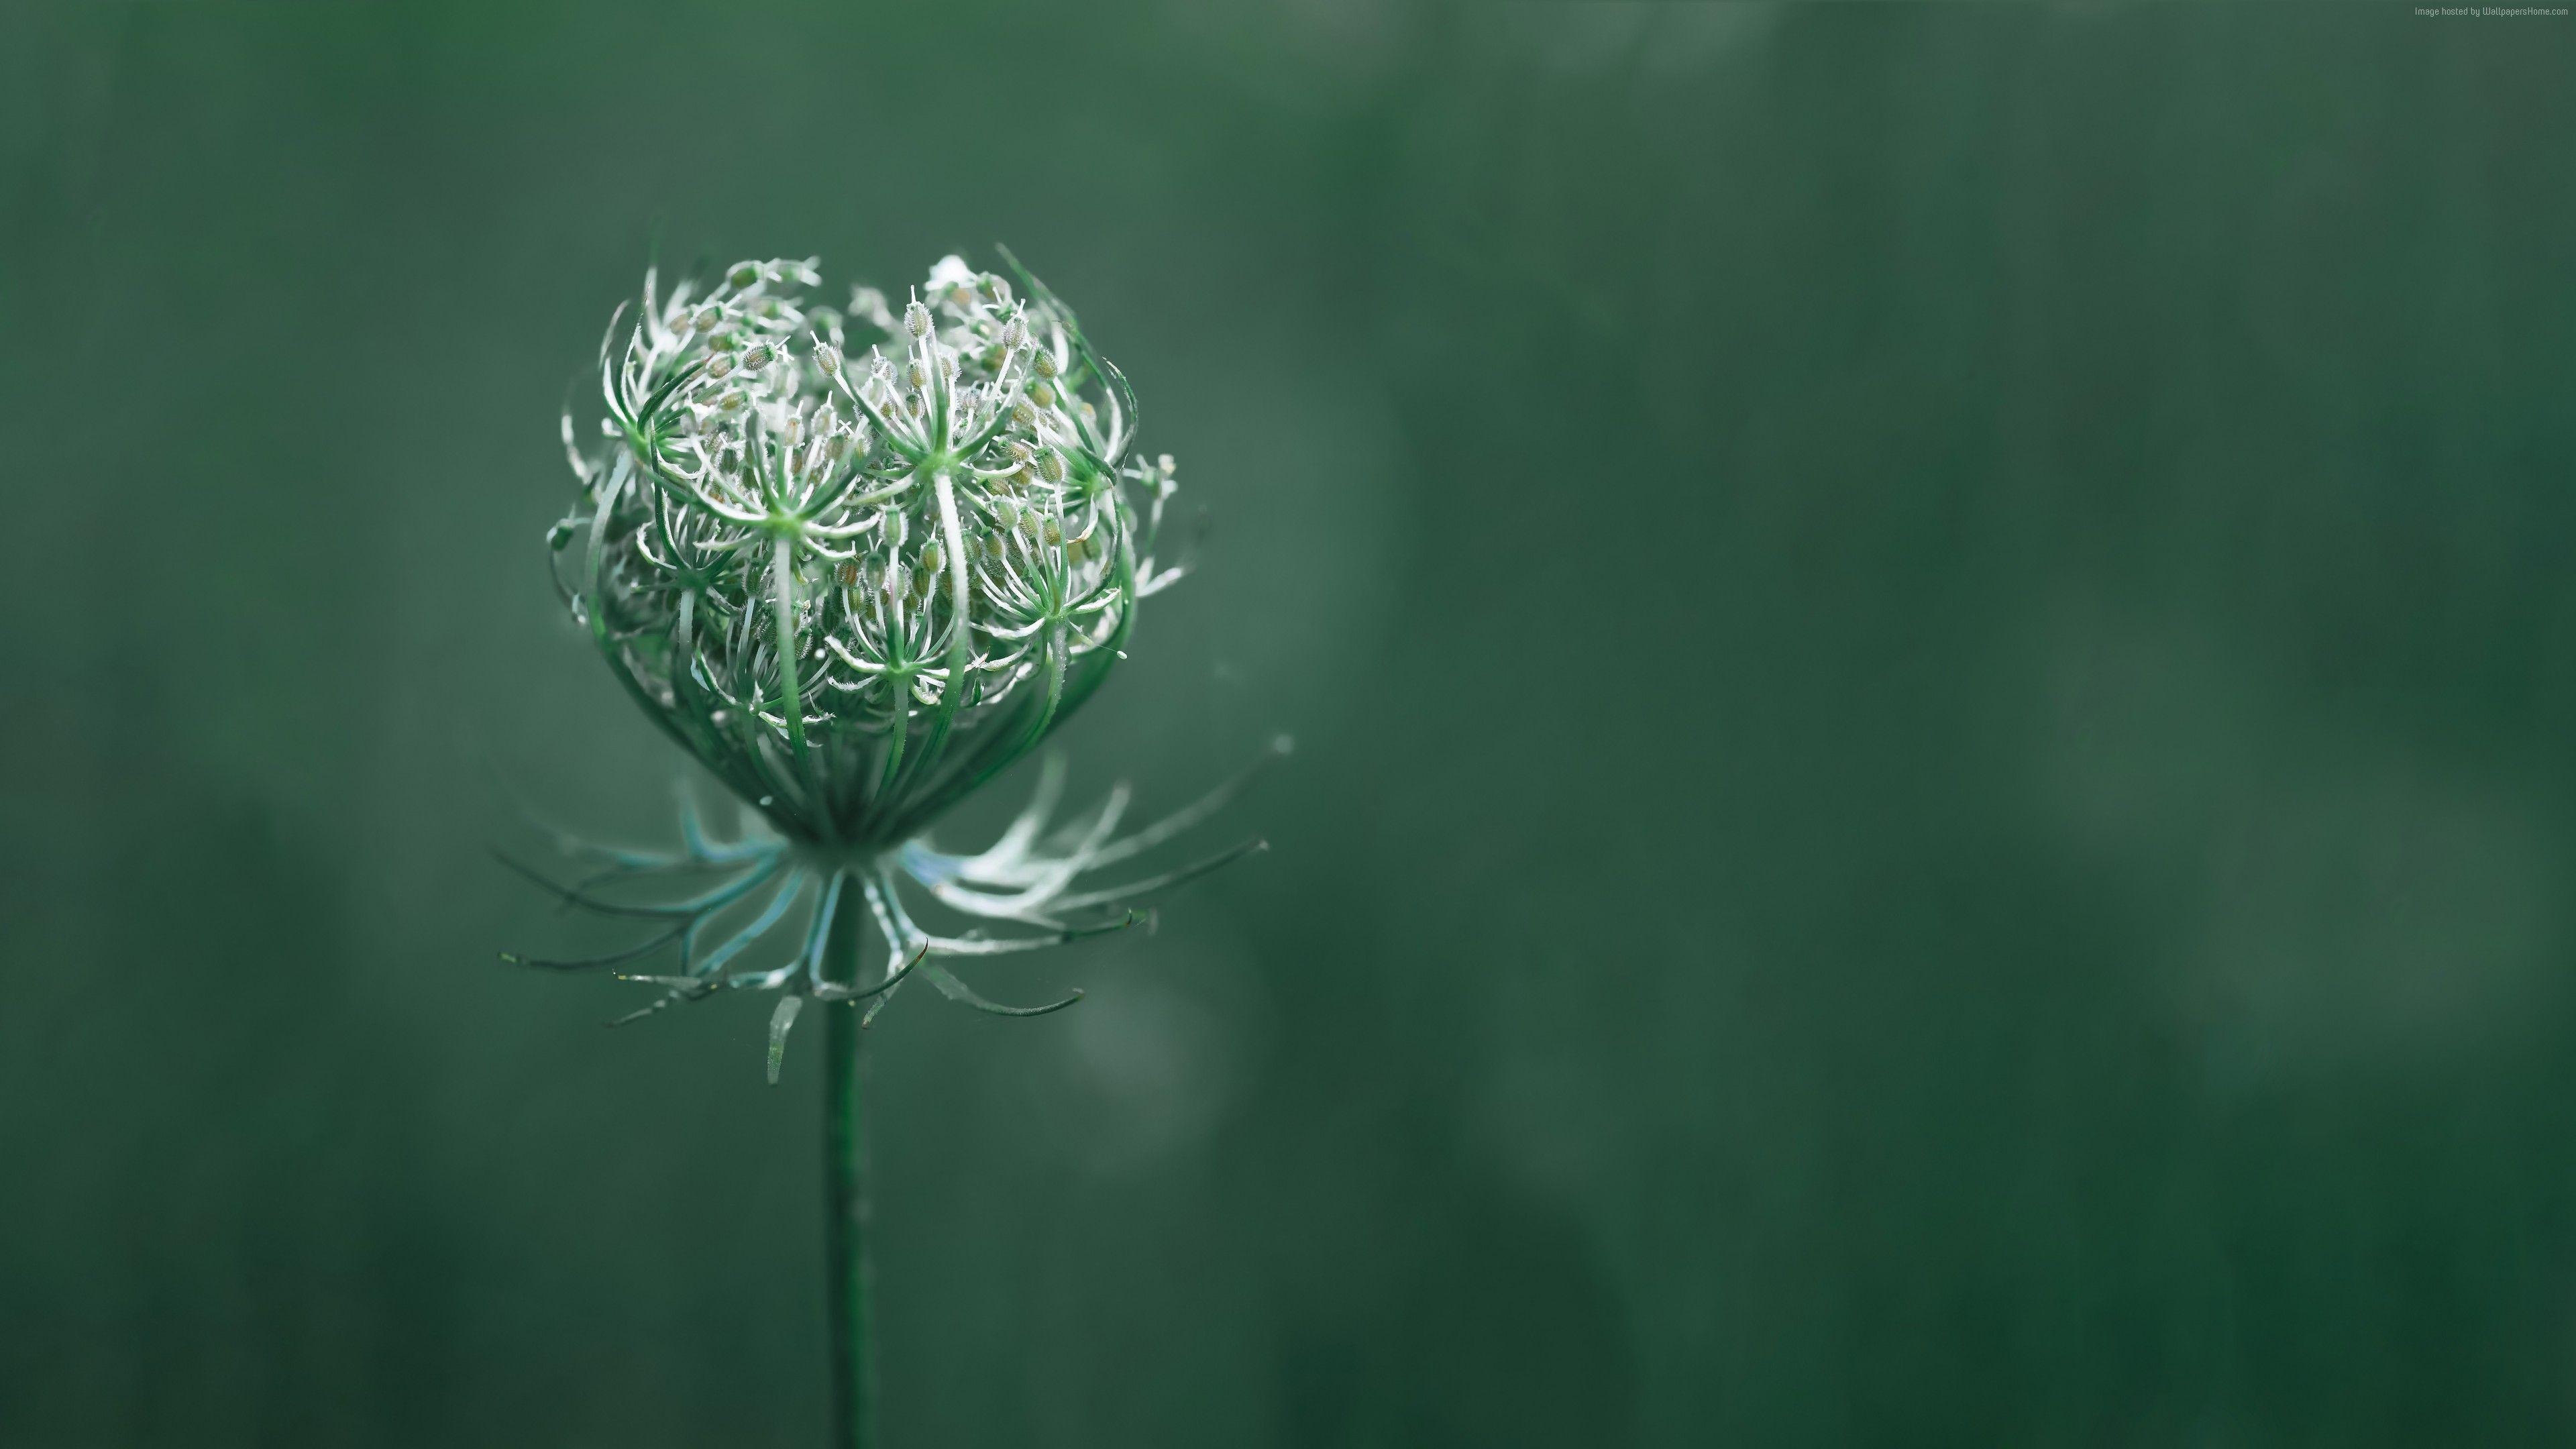 Wallpaper Flower Green Macro 10k Nature Https Www Pxwall Com